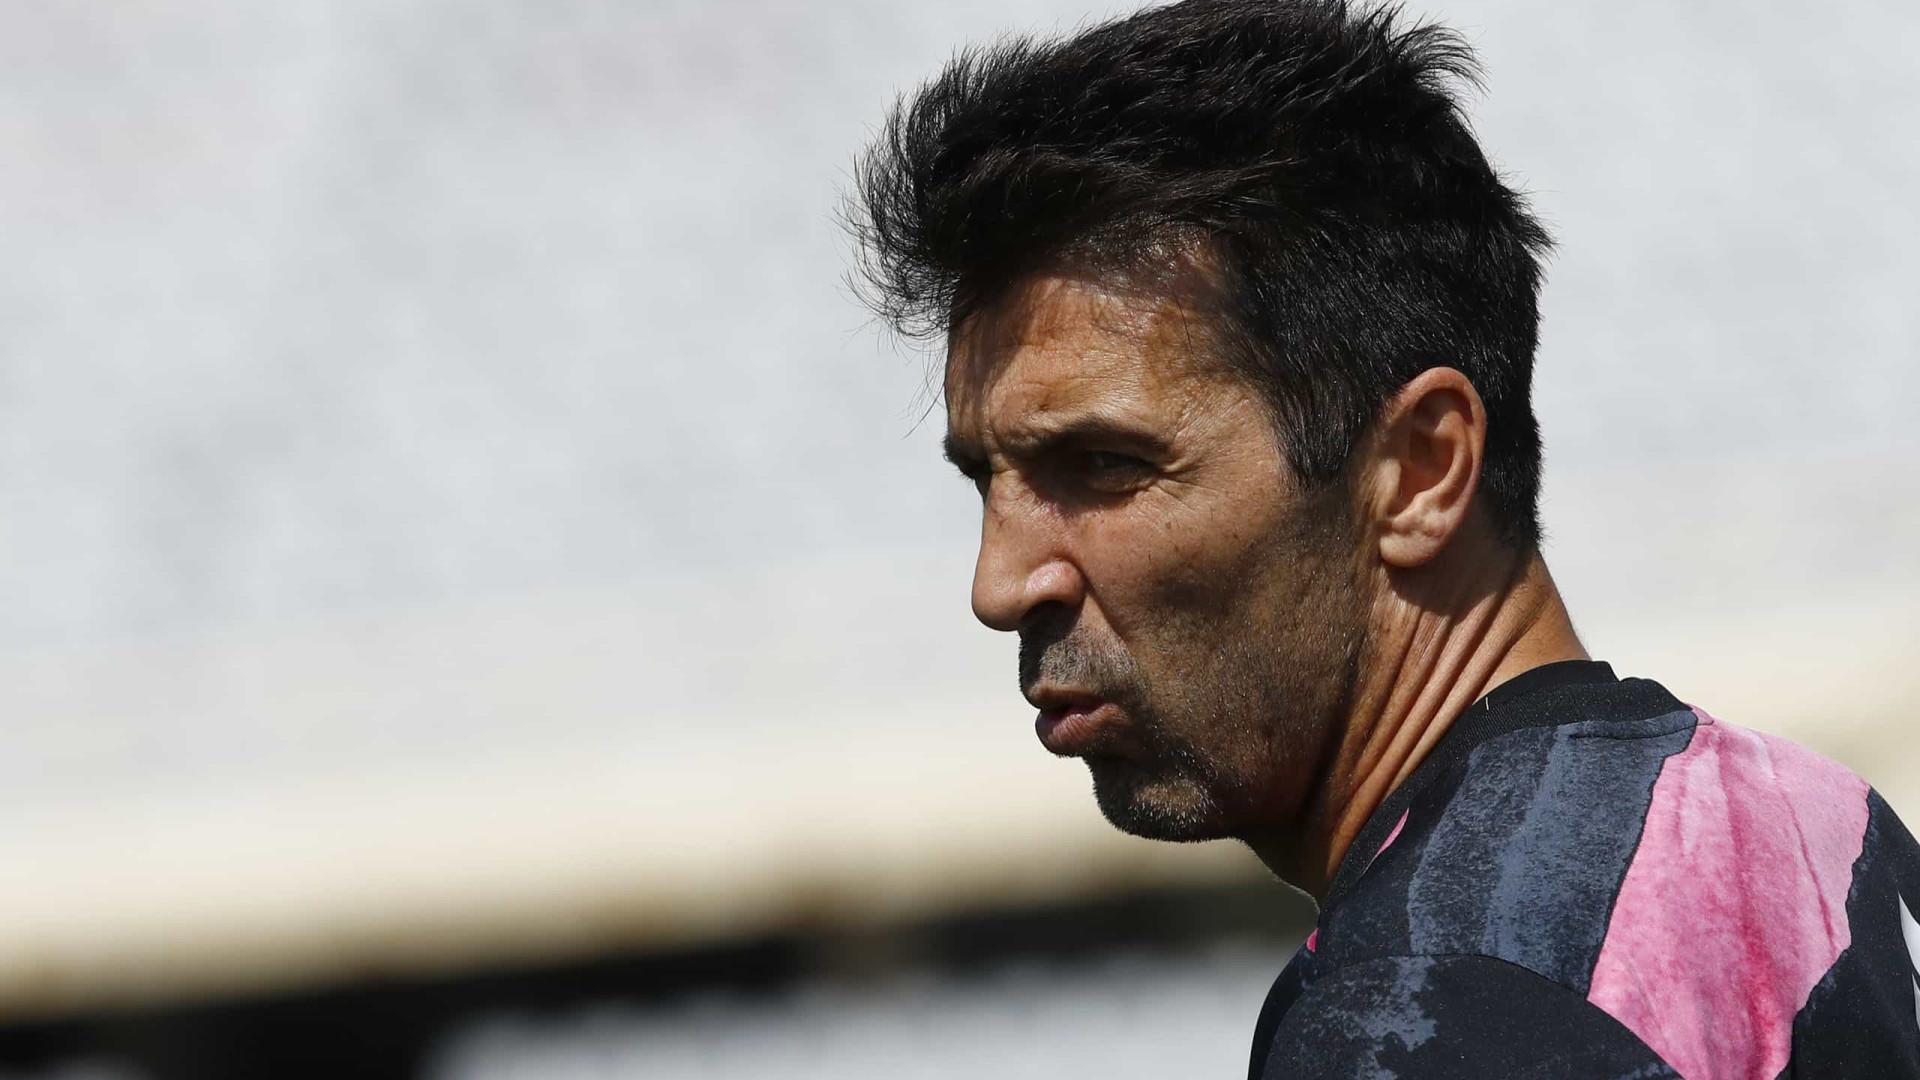 Buffon confirma saída da Juventus e diz que está 'refletindo' sobre aposentadoria